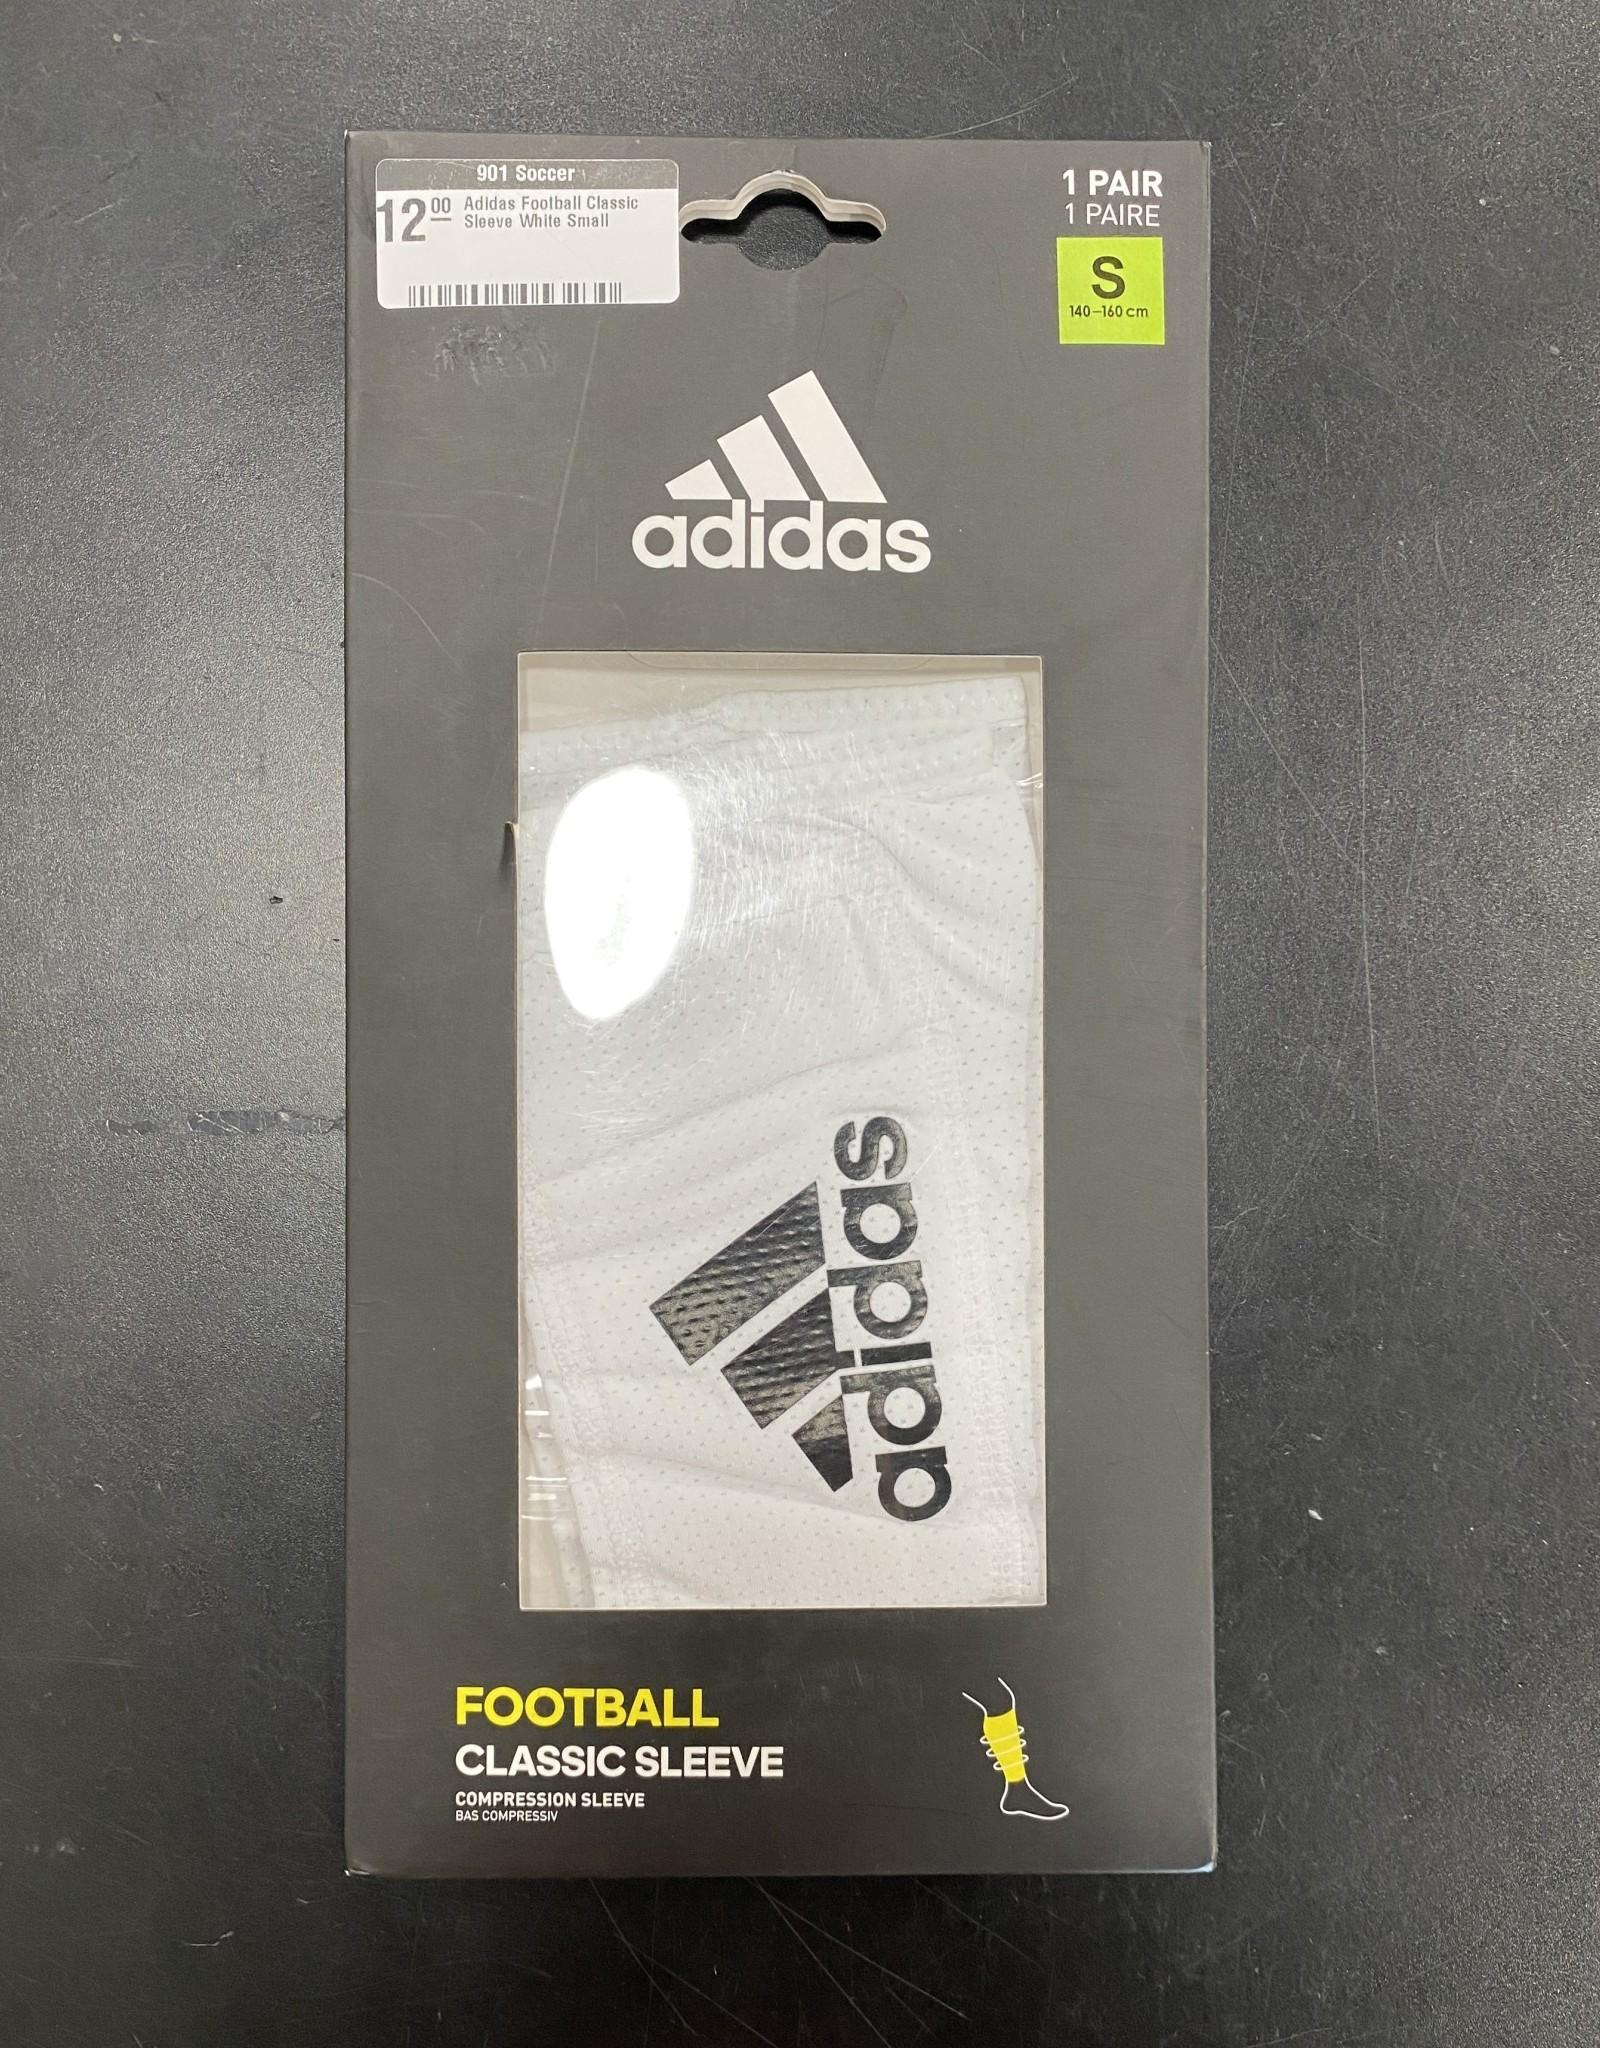 Adidas Adidas Football Classic Sleeve